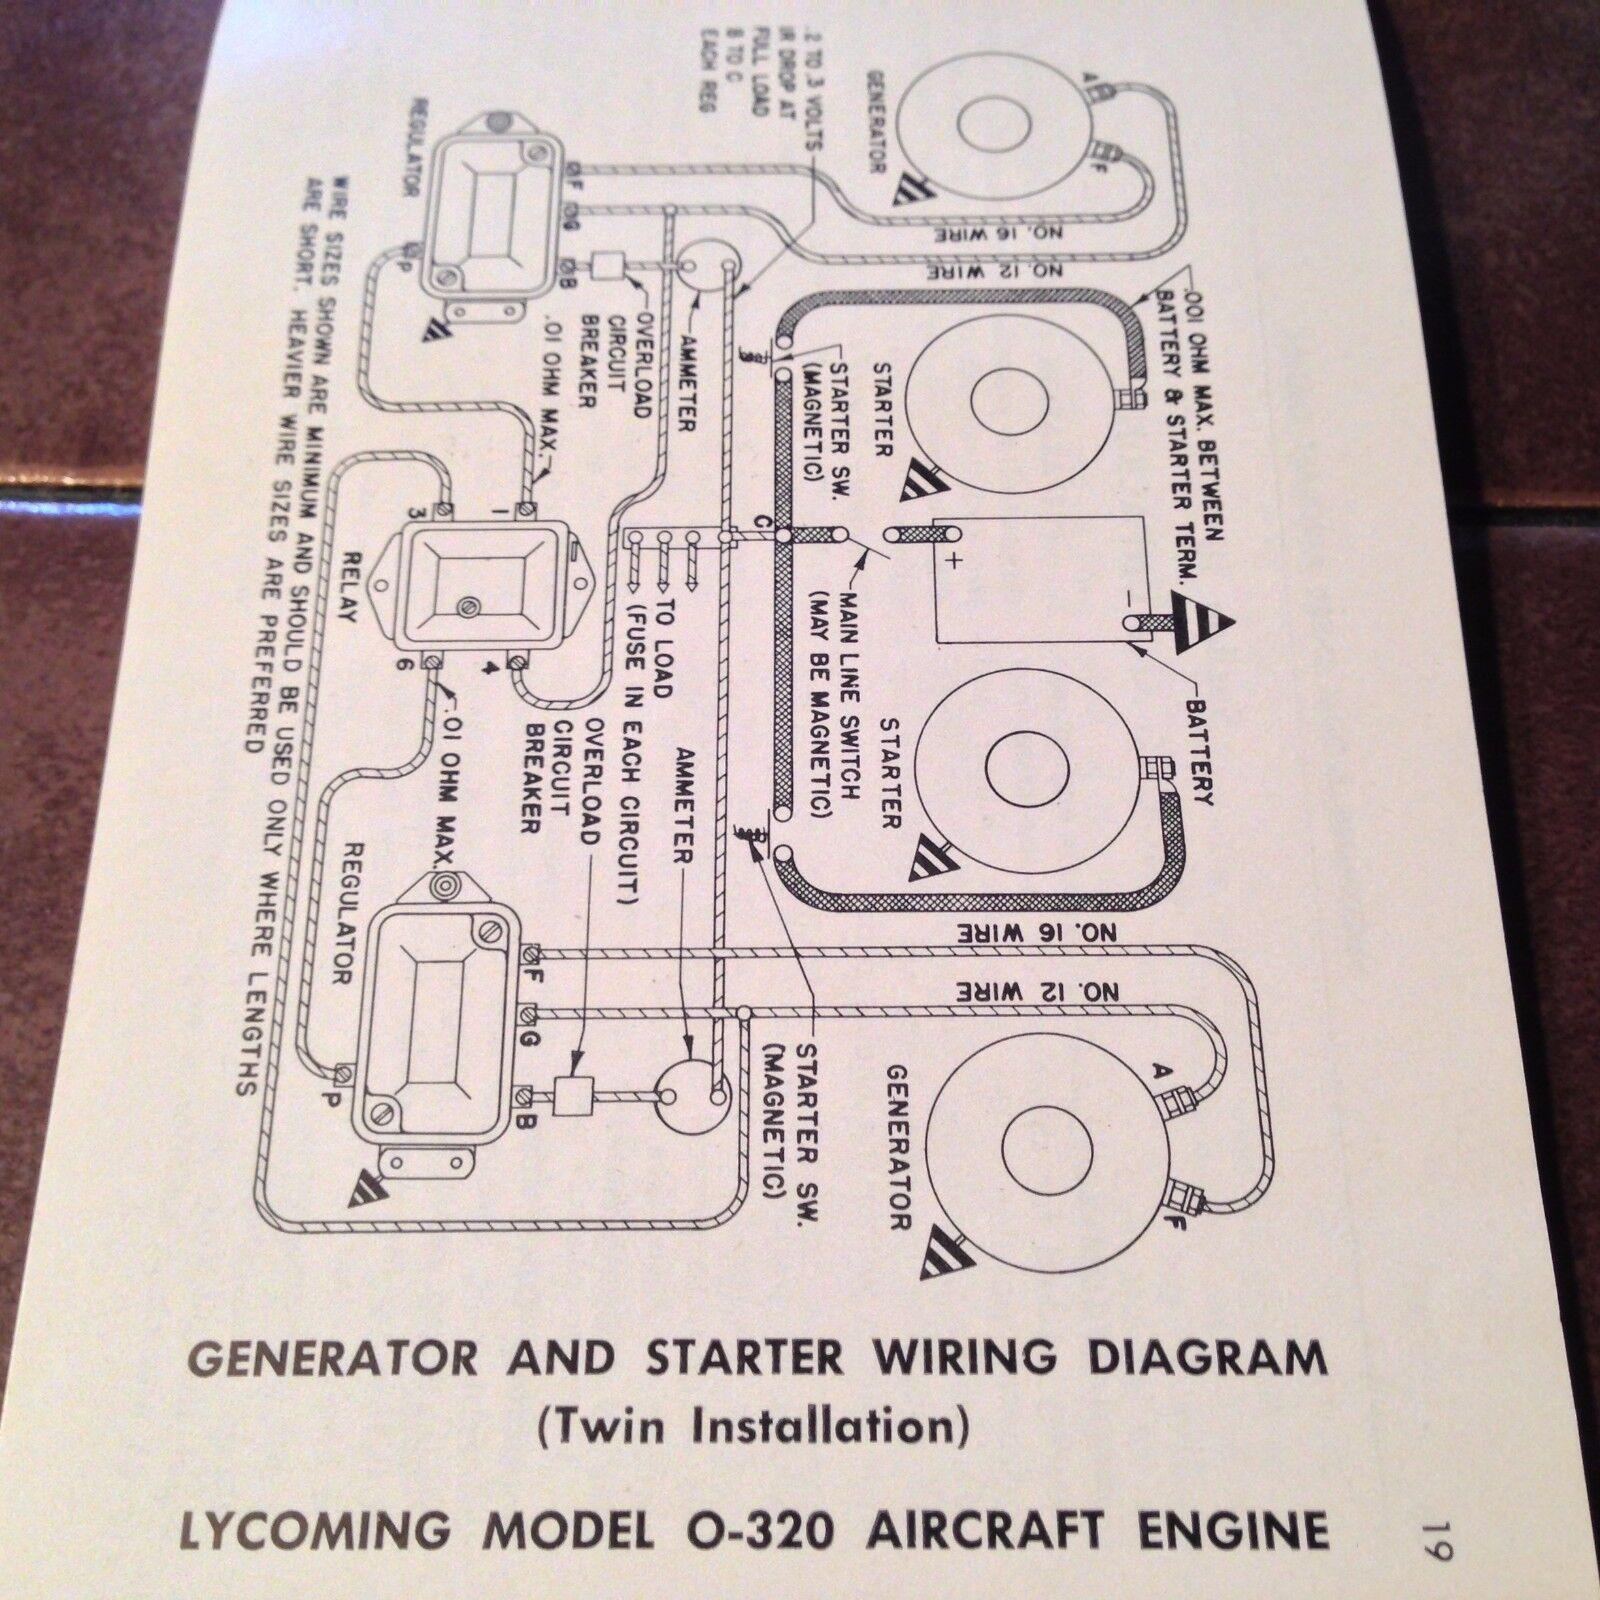 WRG-5951] Hovercraft Rotax 503 Engine Diagram on